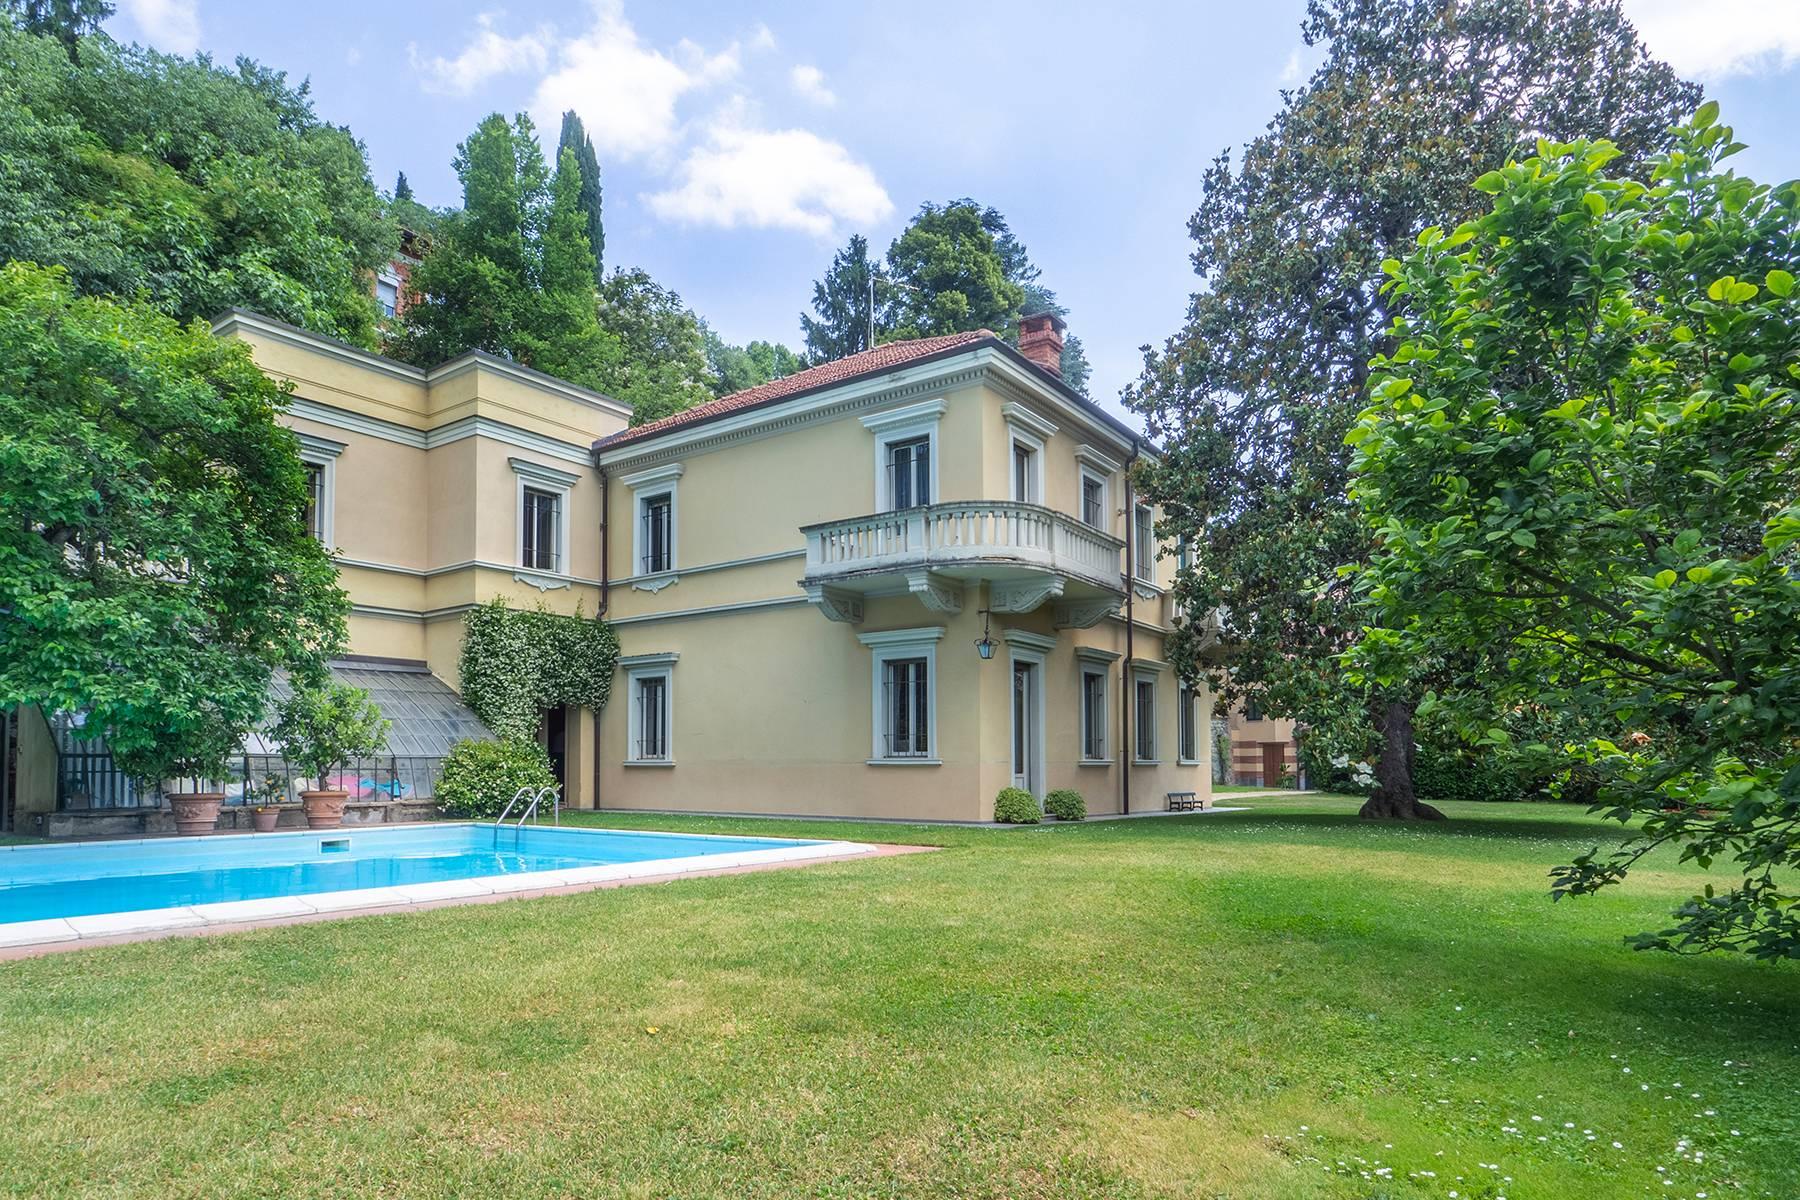 Casa indipendente in Vendita a Torino: 5 locali, 657 mq - Foto 3